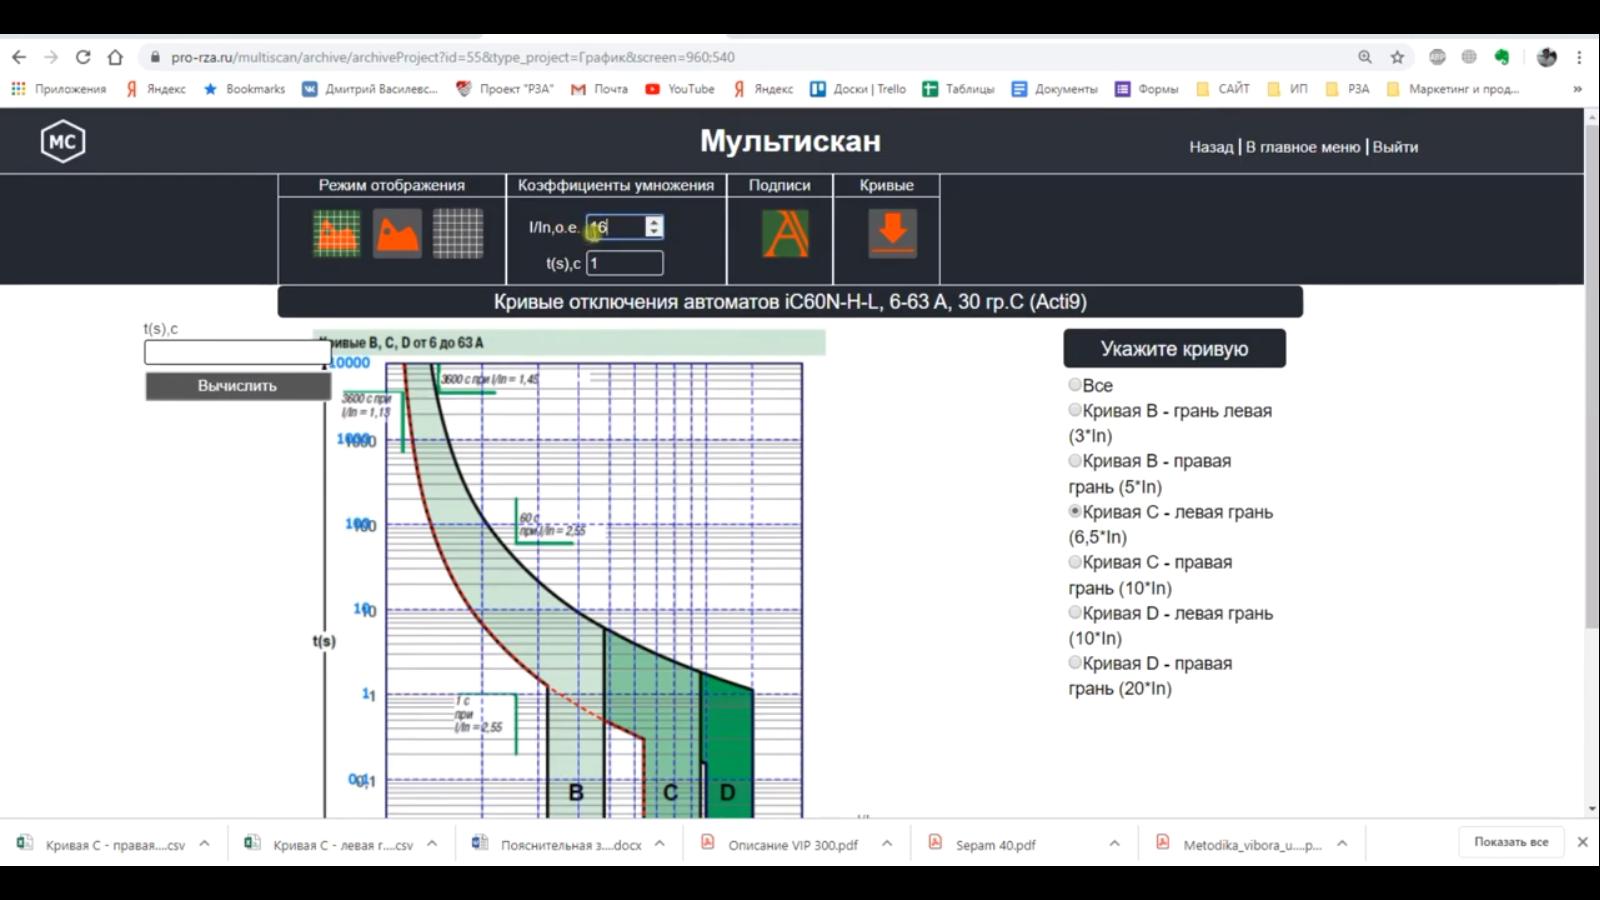 Сканирование характеристики автомата 0,4 кВ в Мультискан